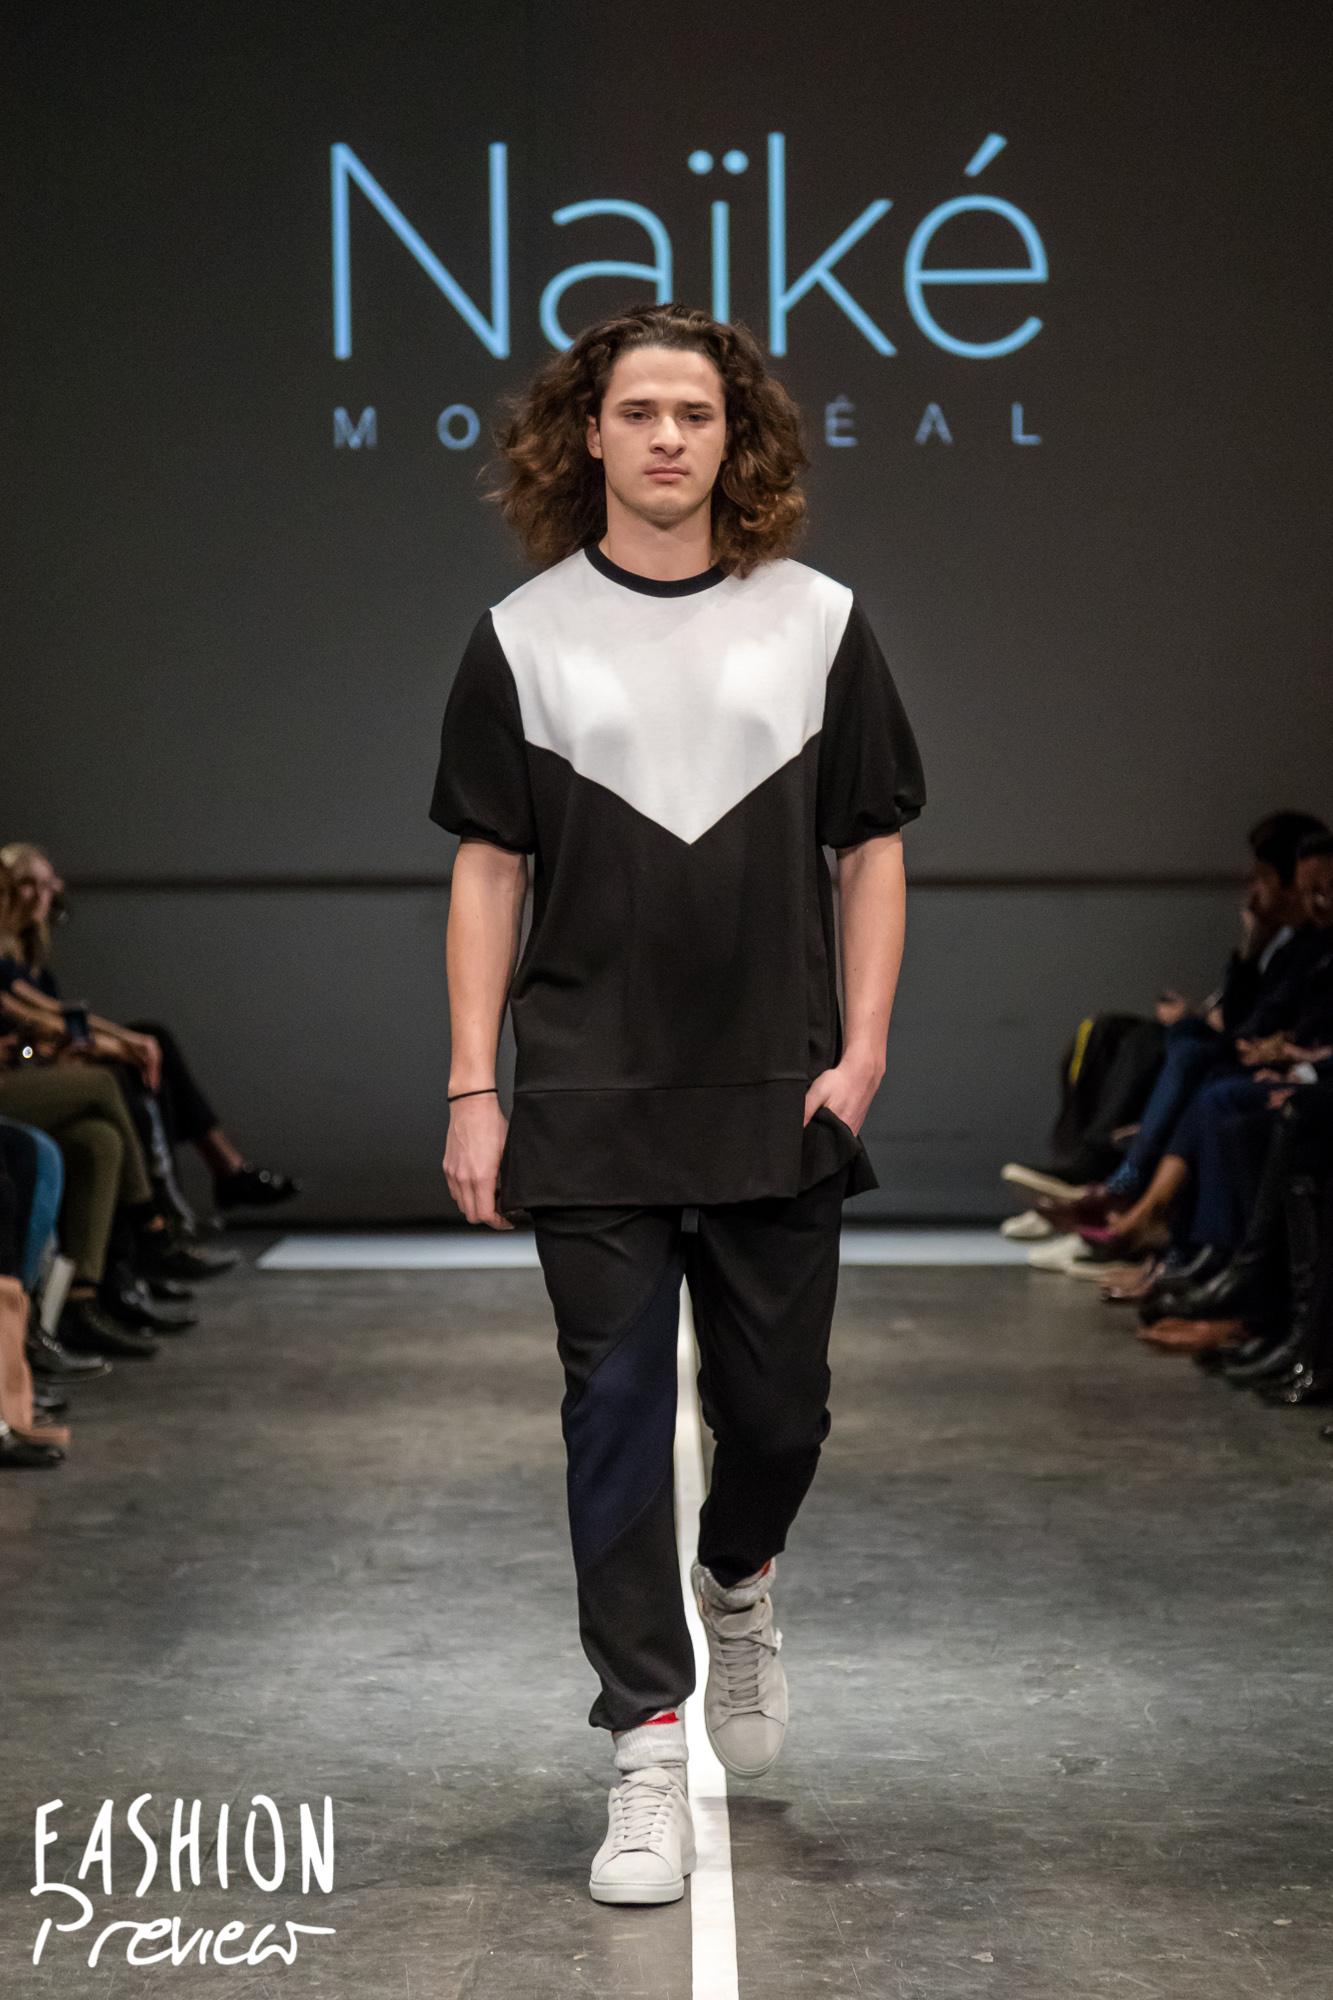 Fashion Preview 9 - Naike-05.jpg